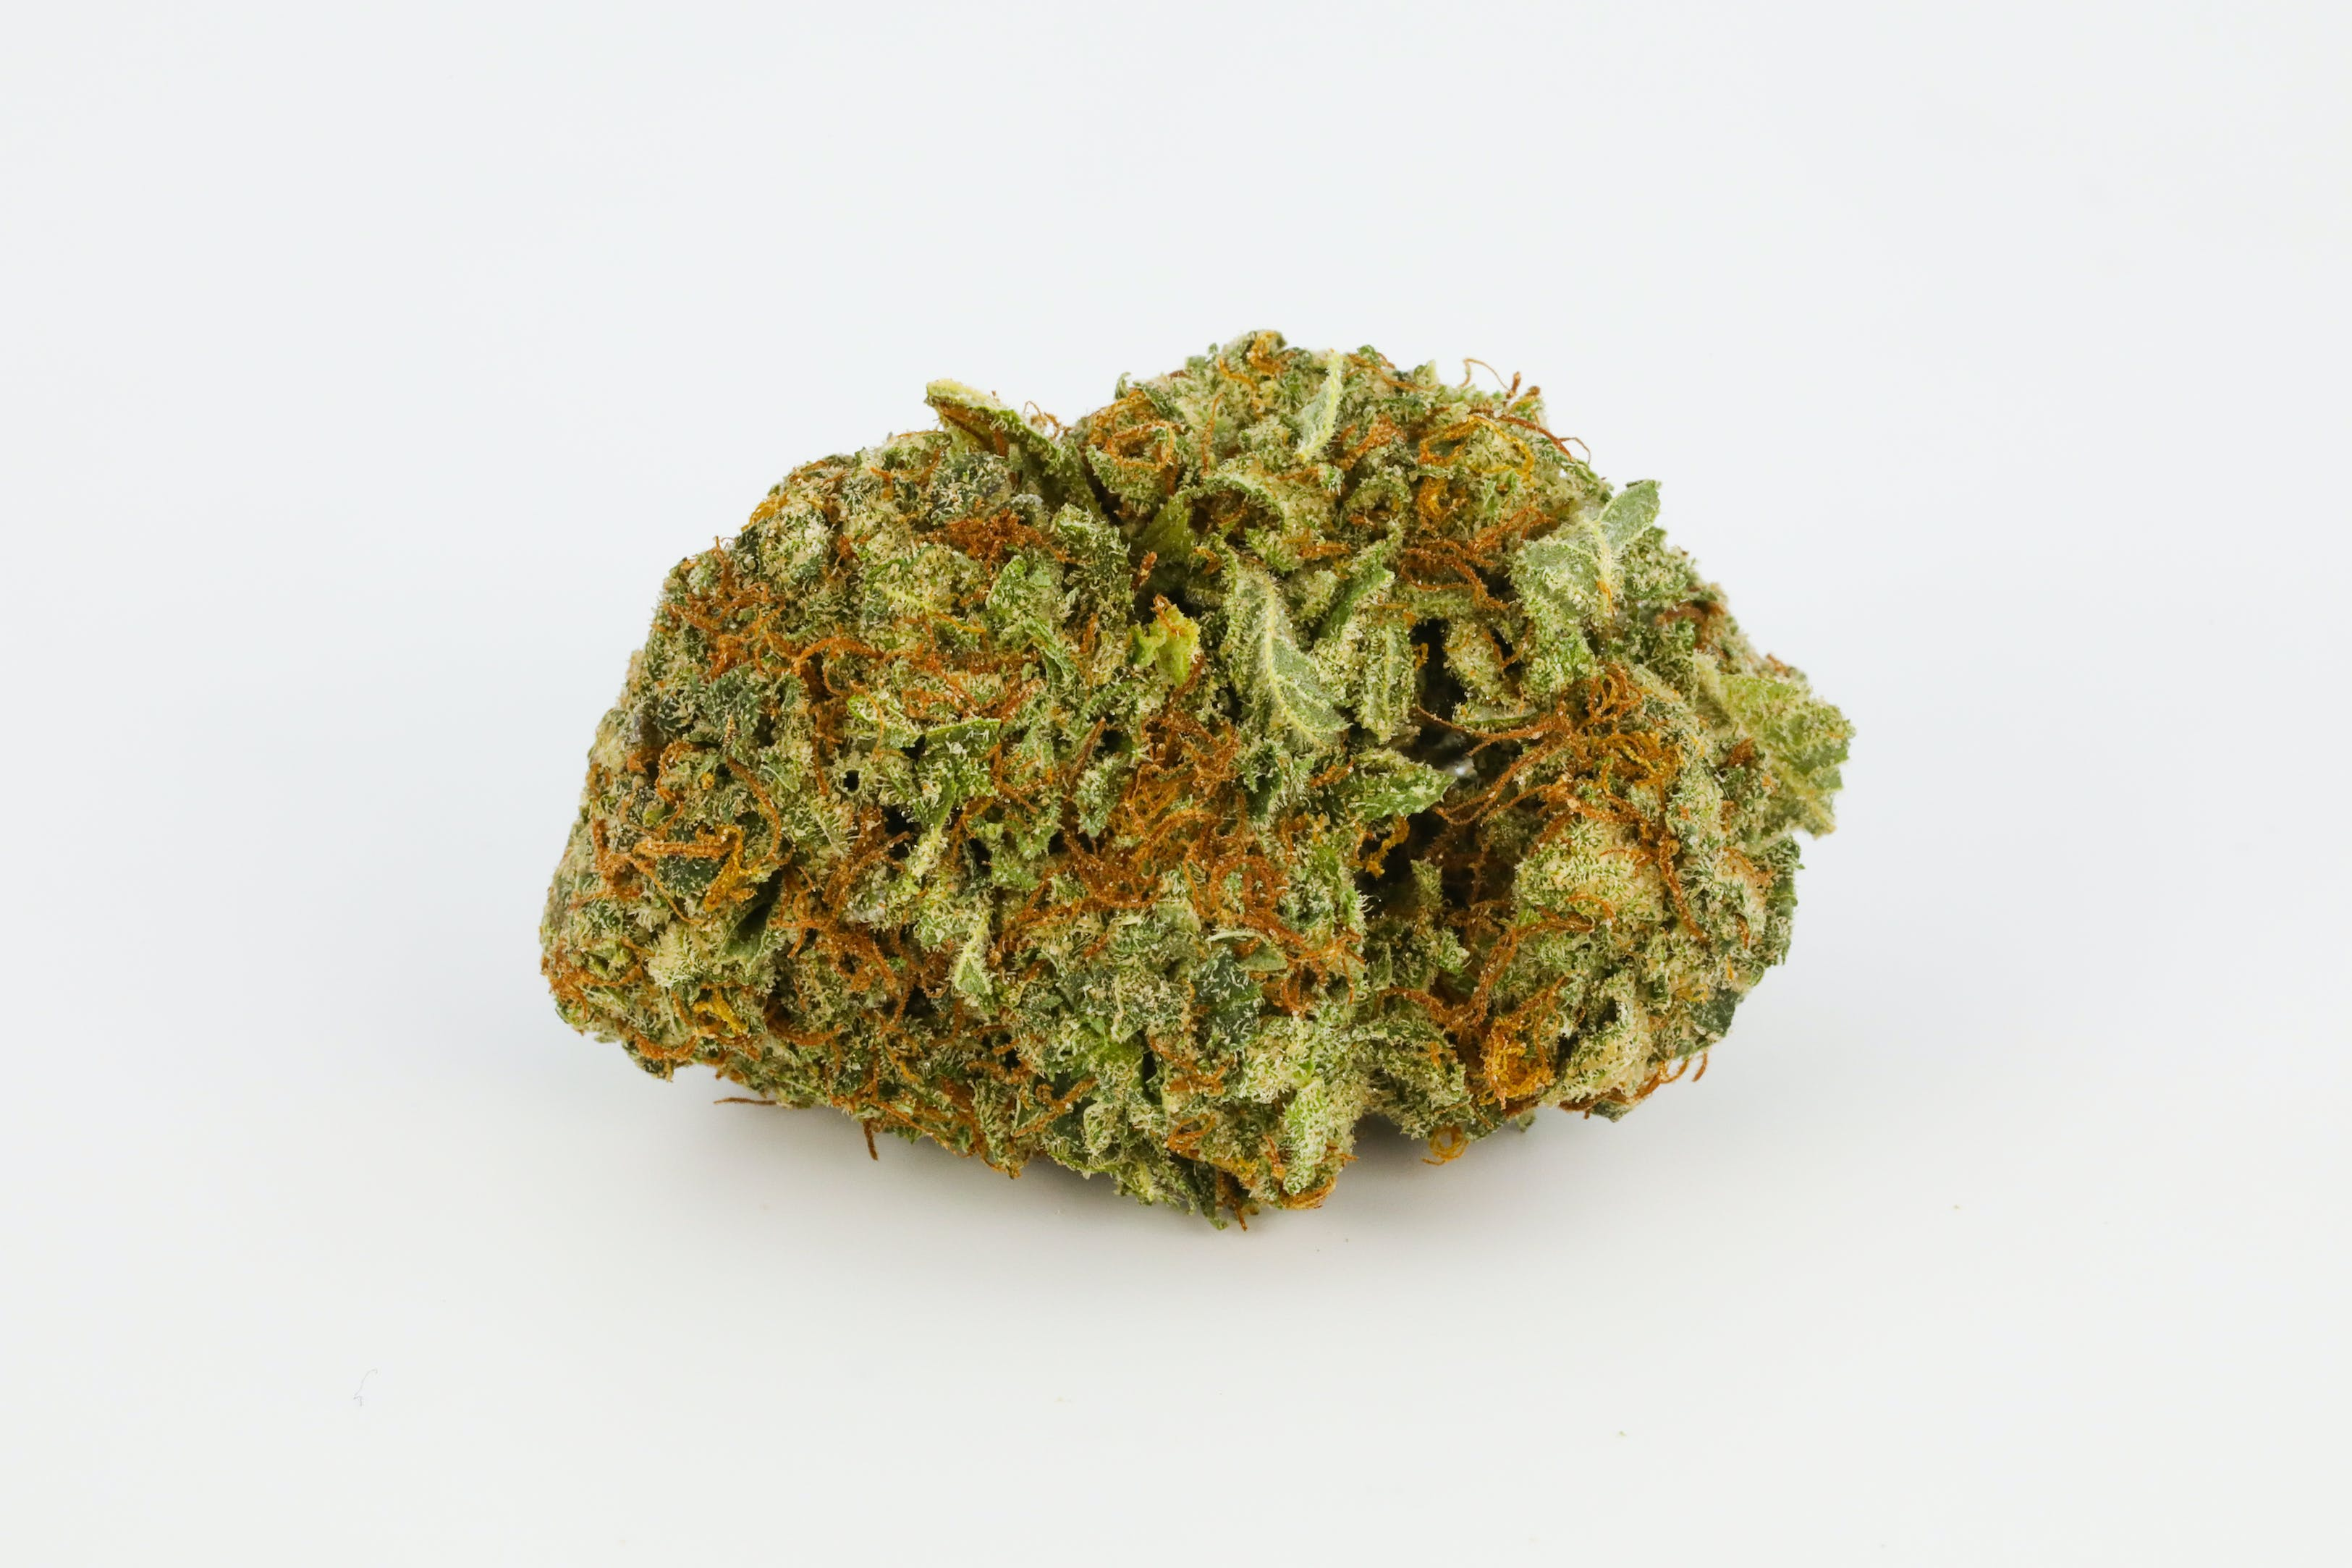 Bianca Weed; Bianca Cannabis Strain; Bianca Hybrid Marijuana Strain